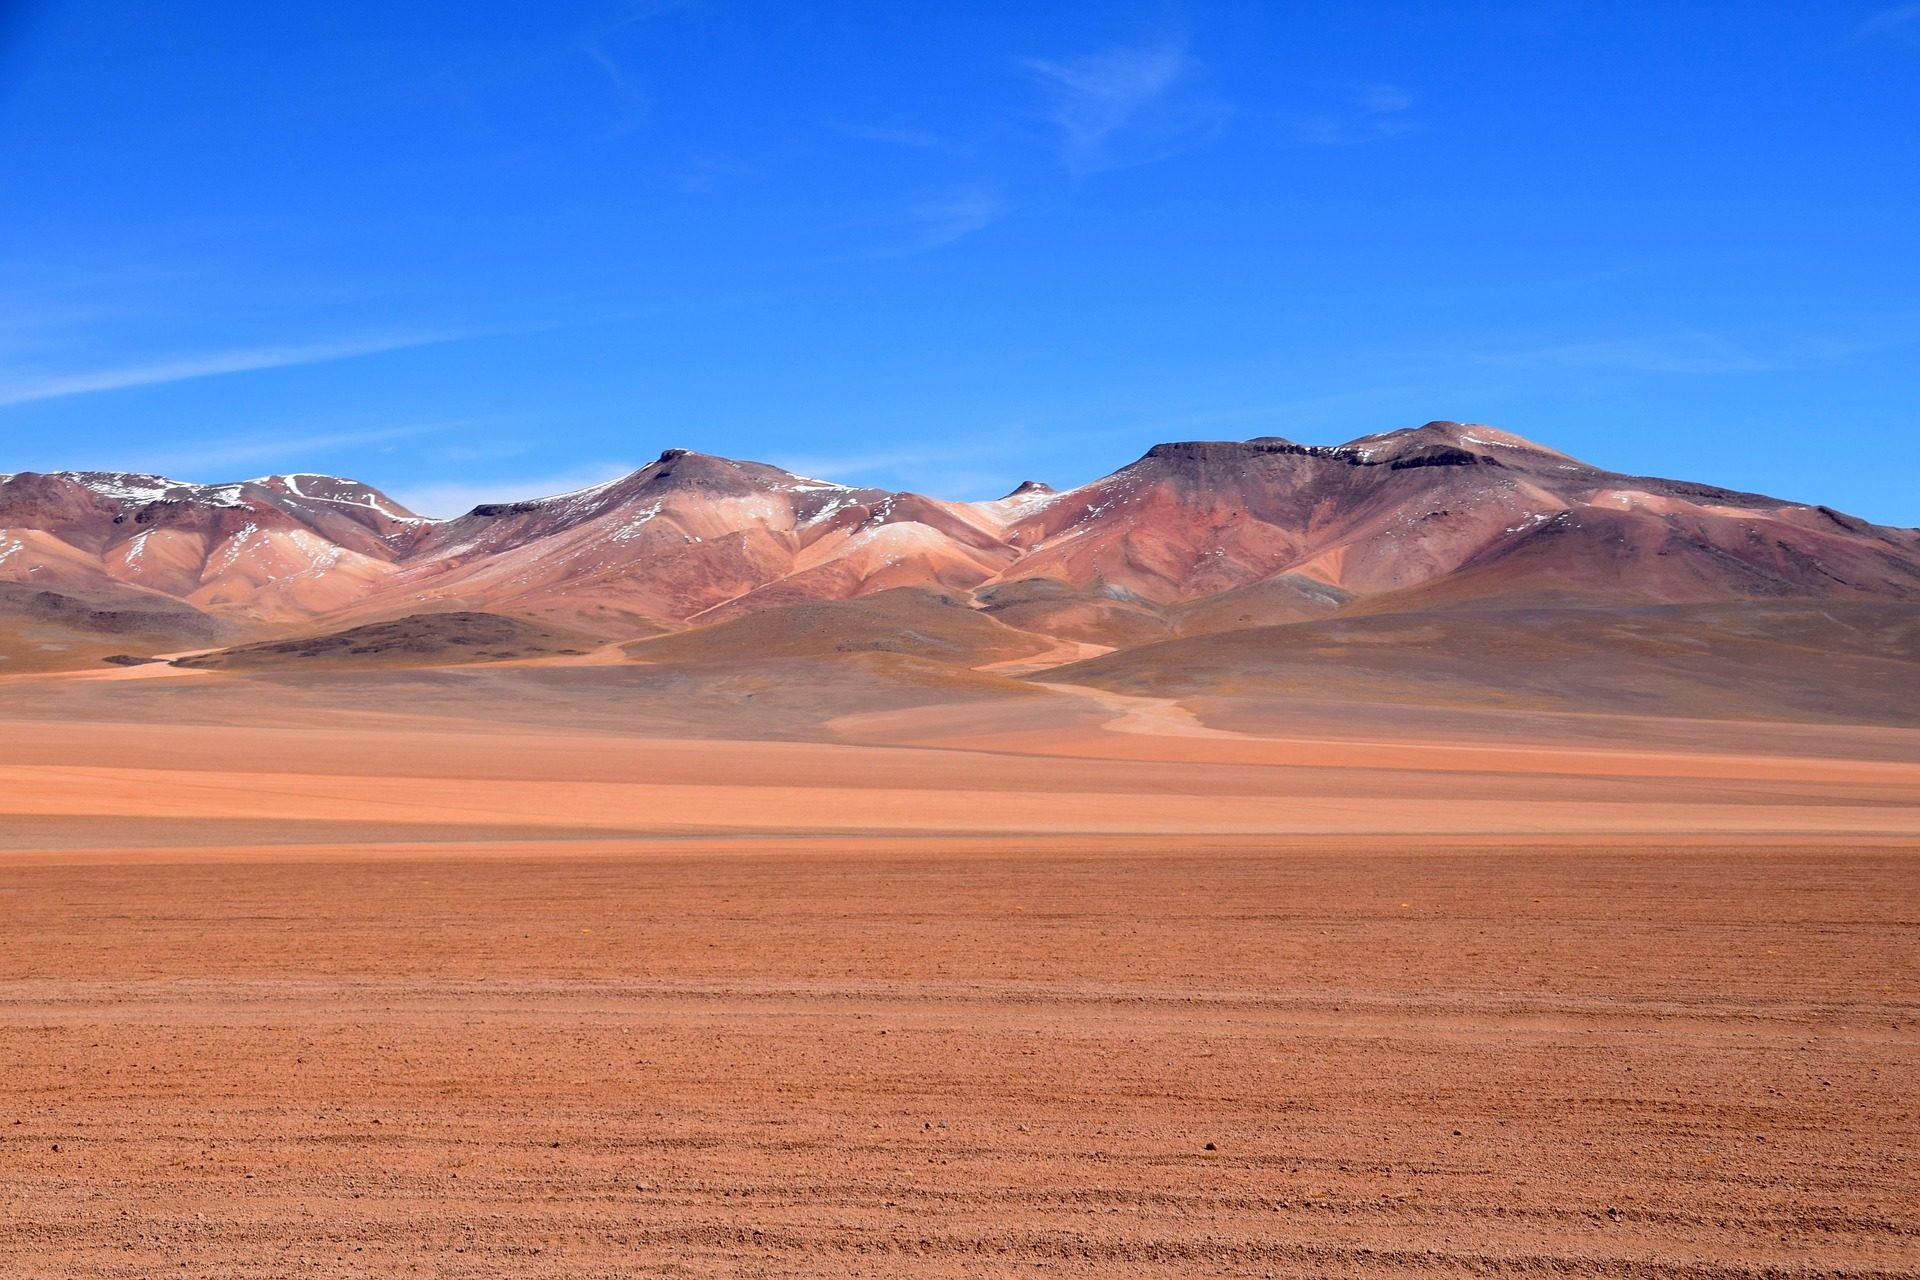 desierto, montañas, nieve, soledad, libertad, bolivia - Fondos de Pantalla HD - professor-falken.com